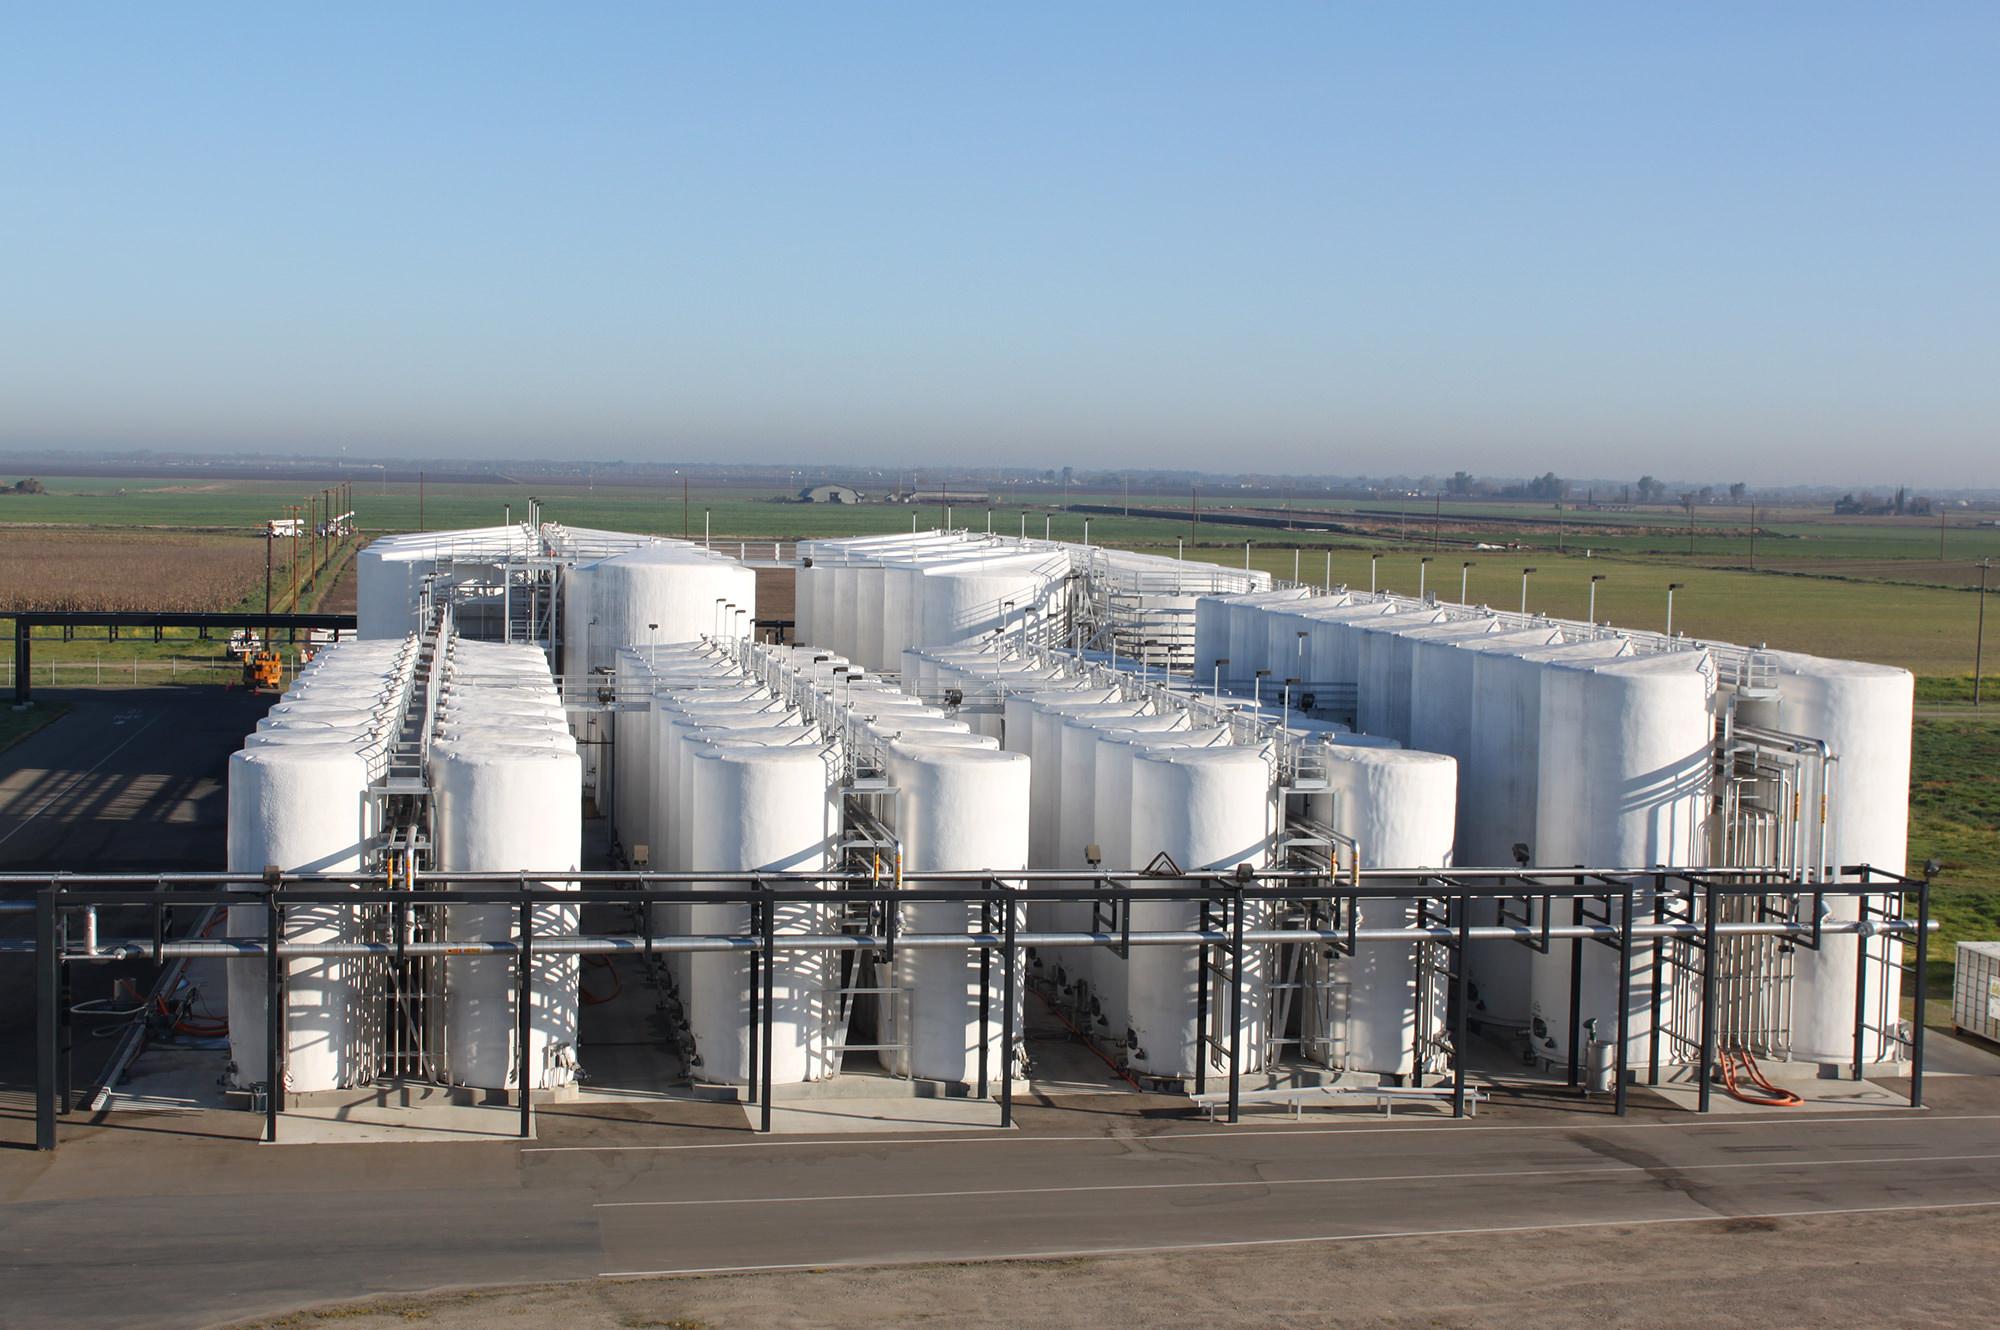 Tank Farm at industrial Winery